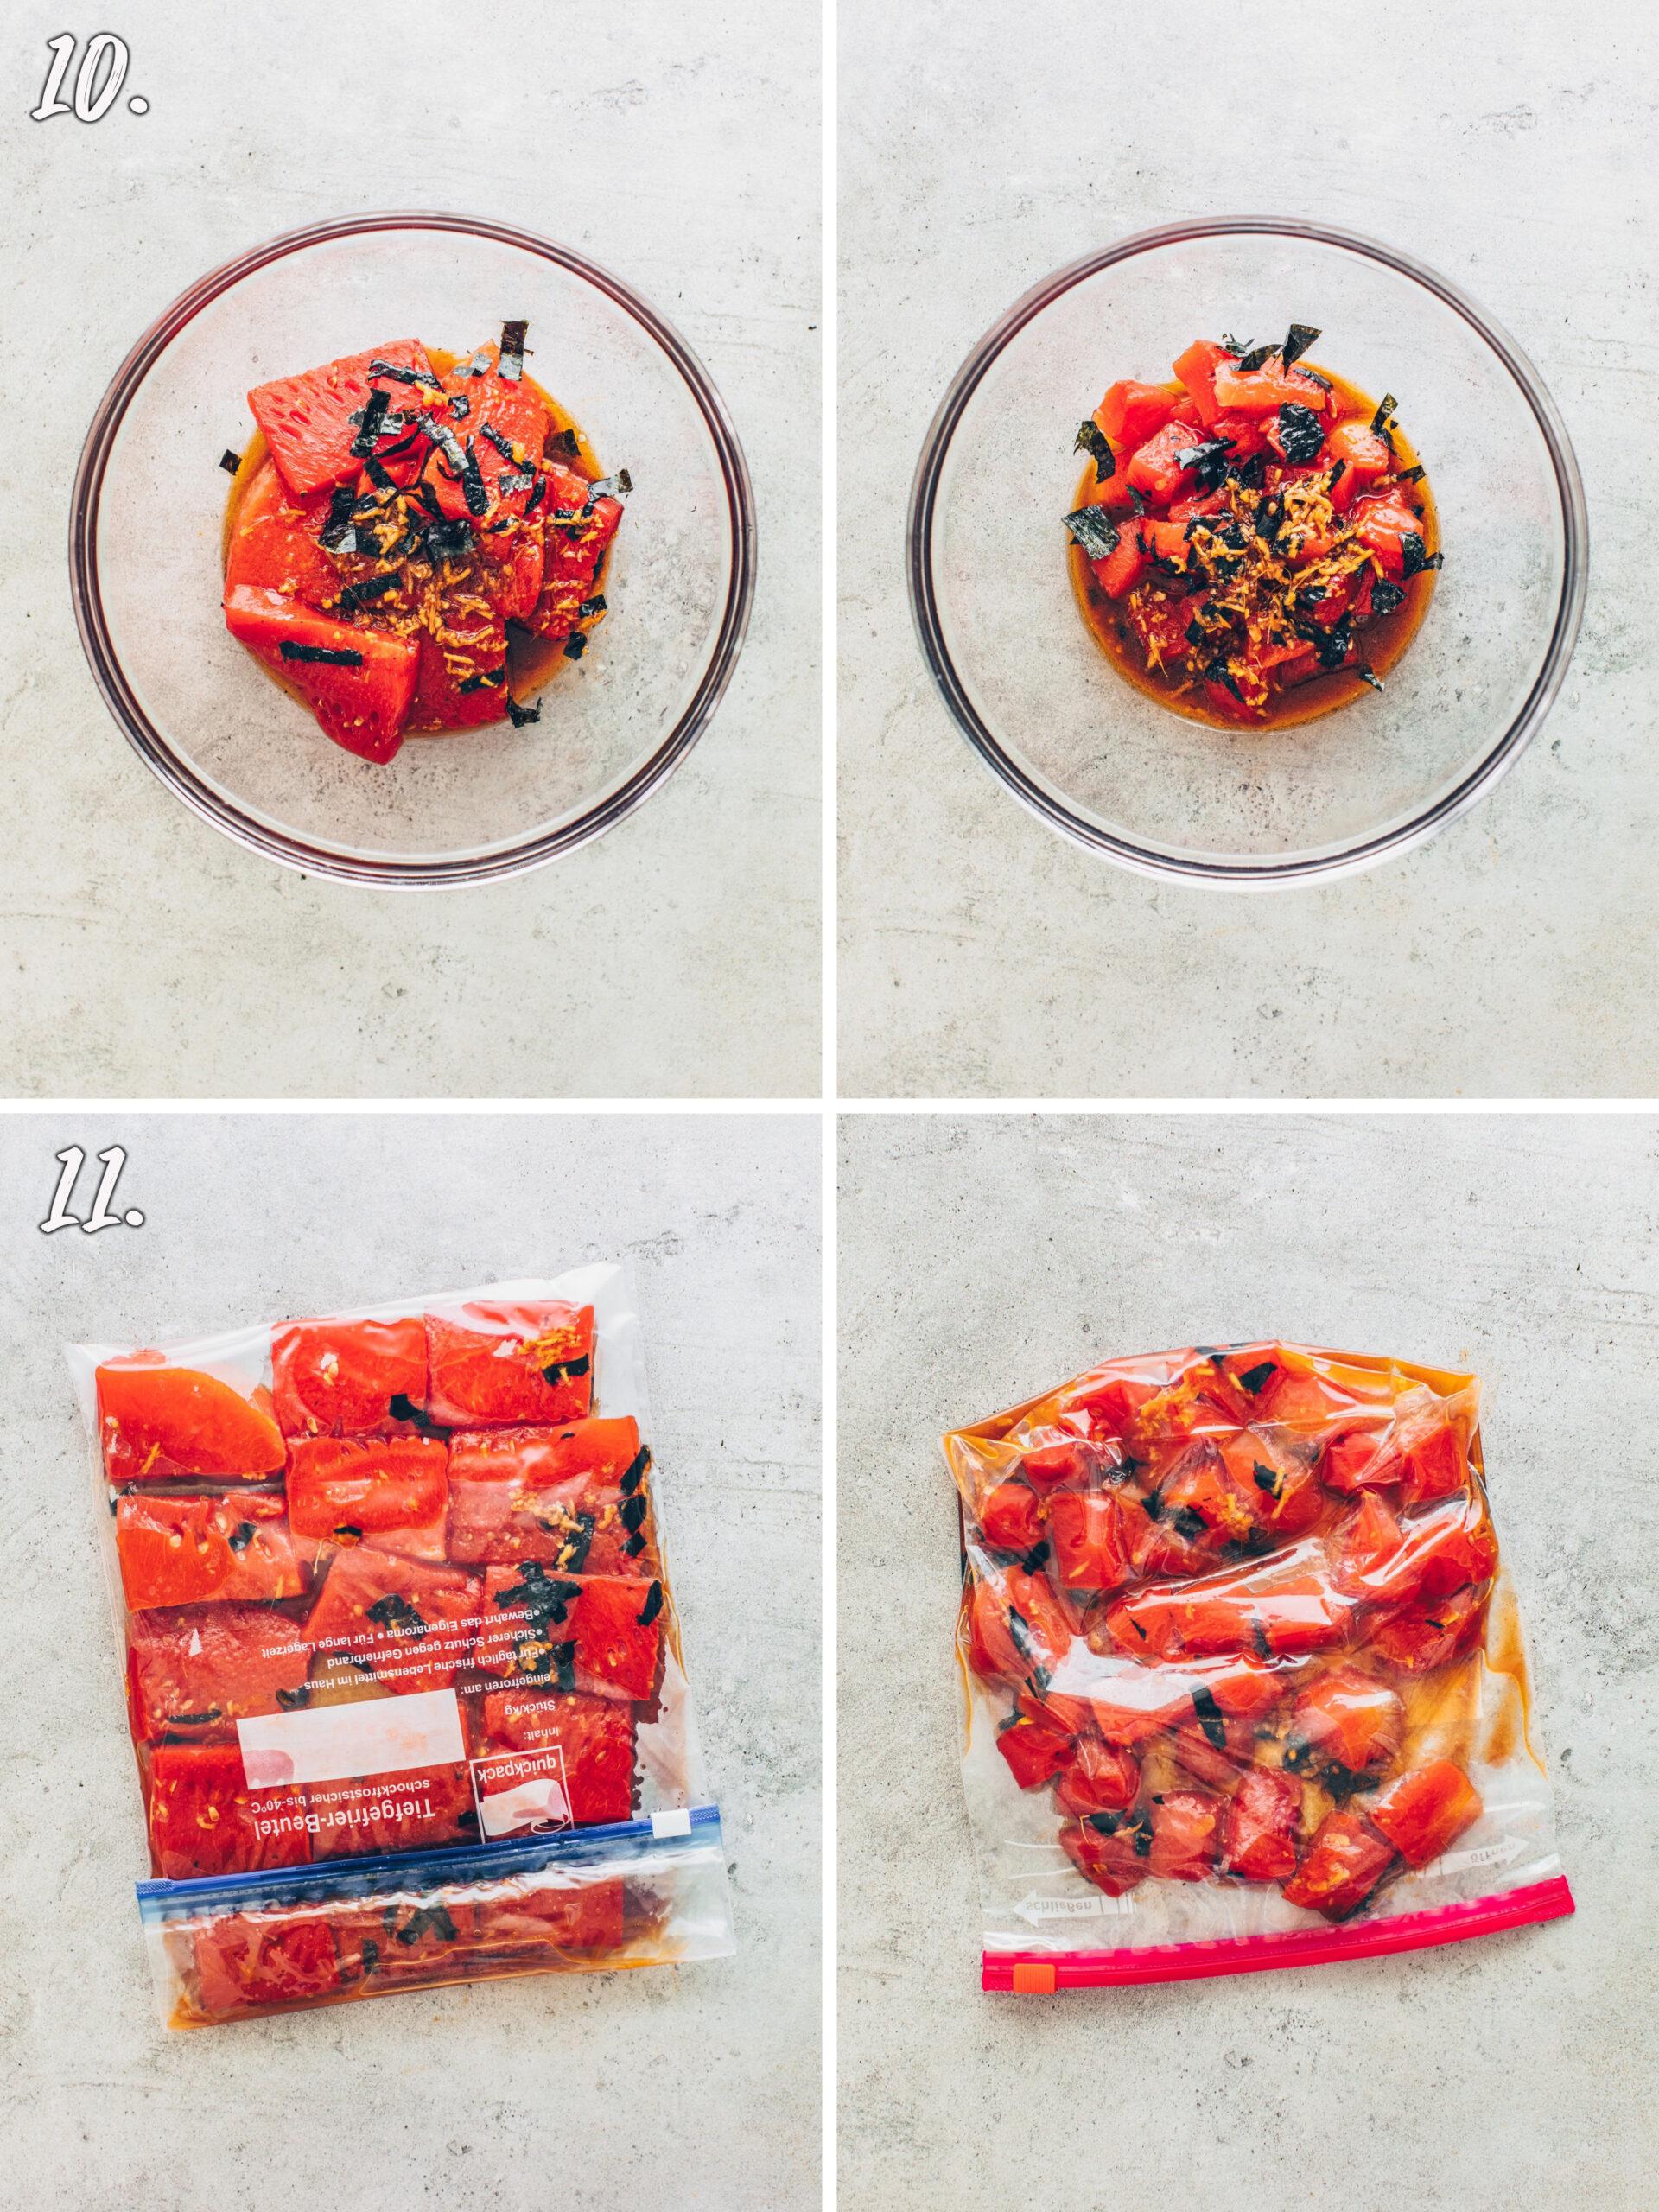 How to make Watermelon Tuna (Vegan Sushi)